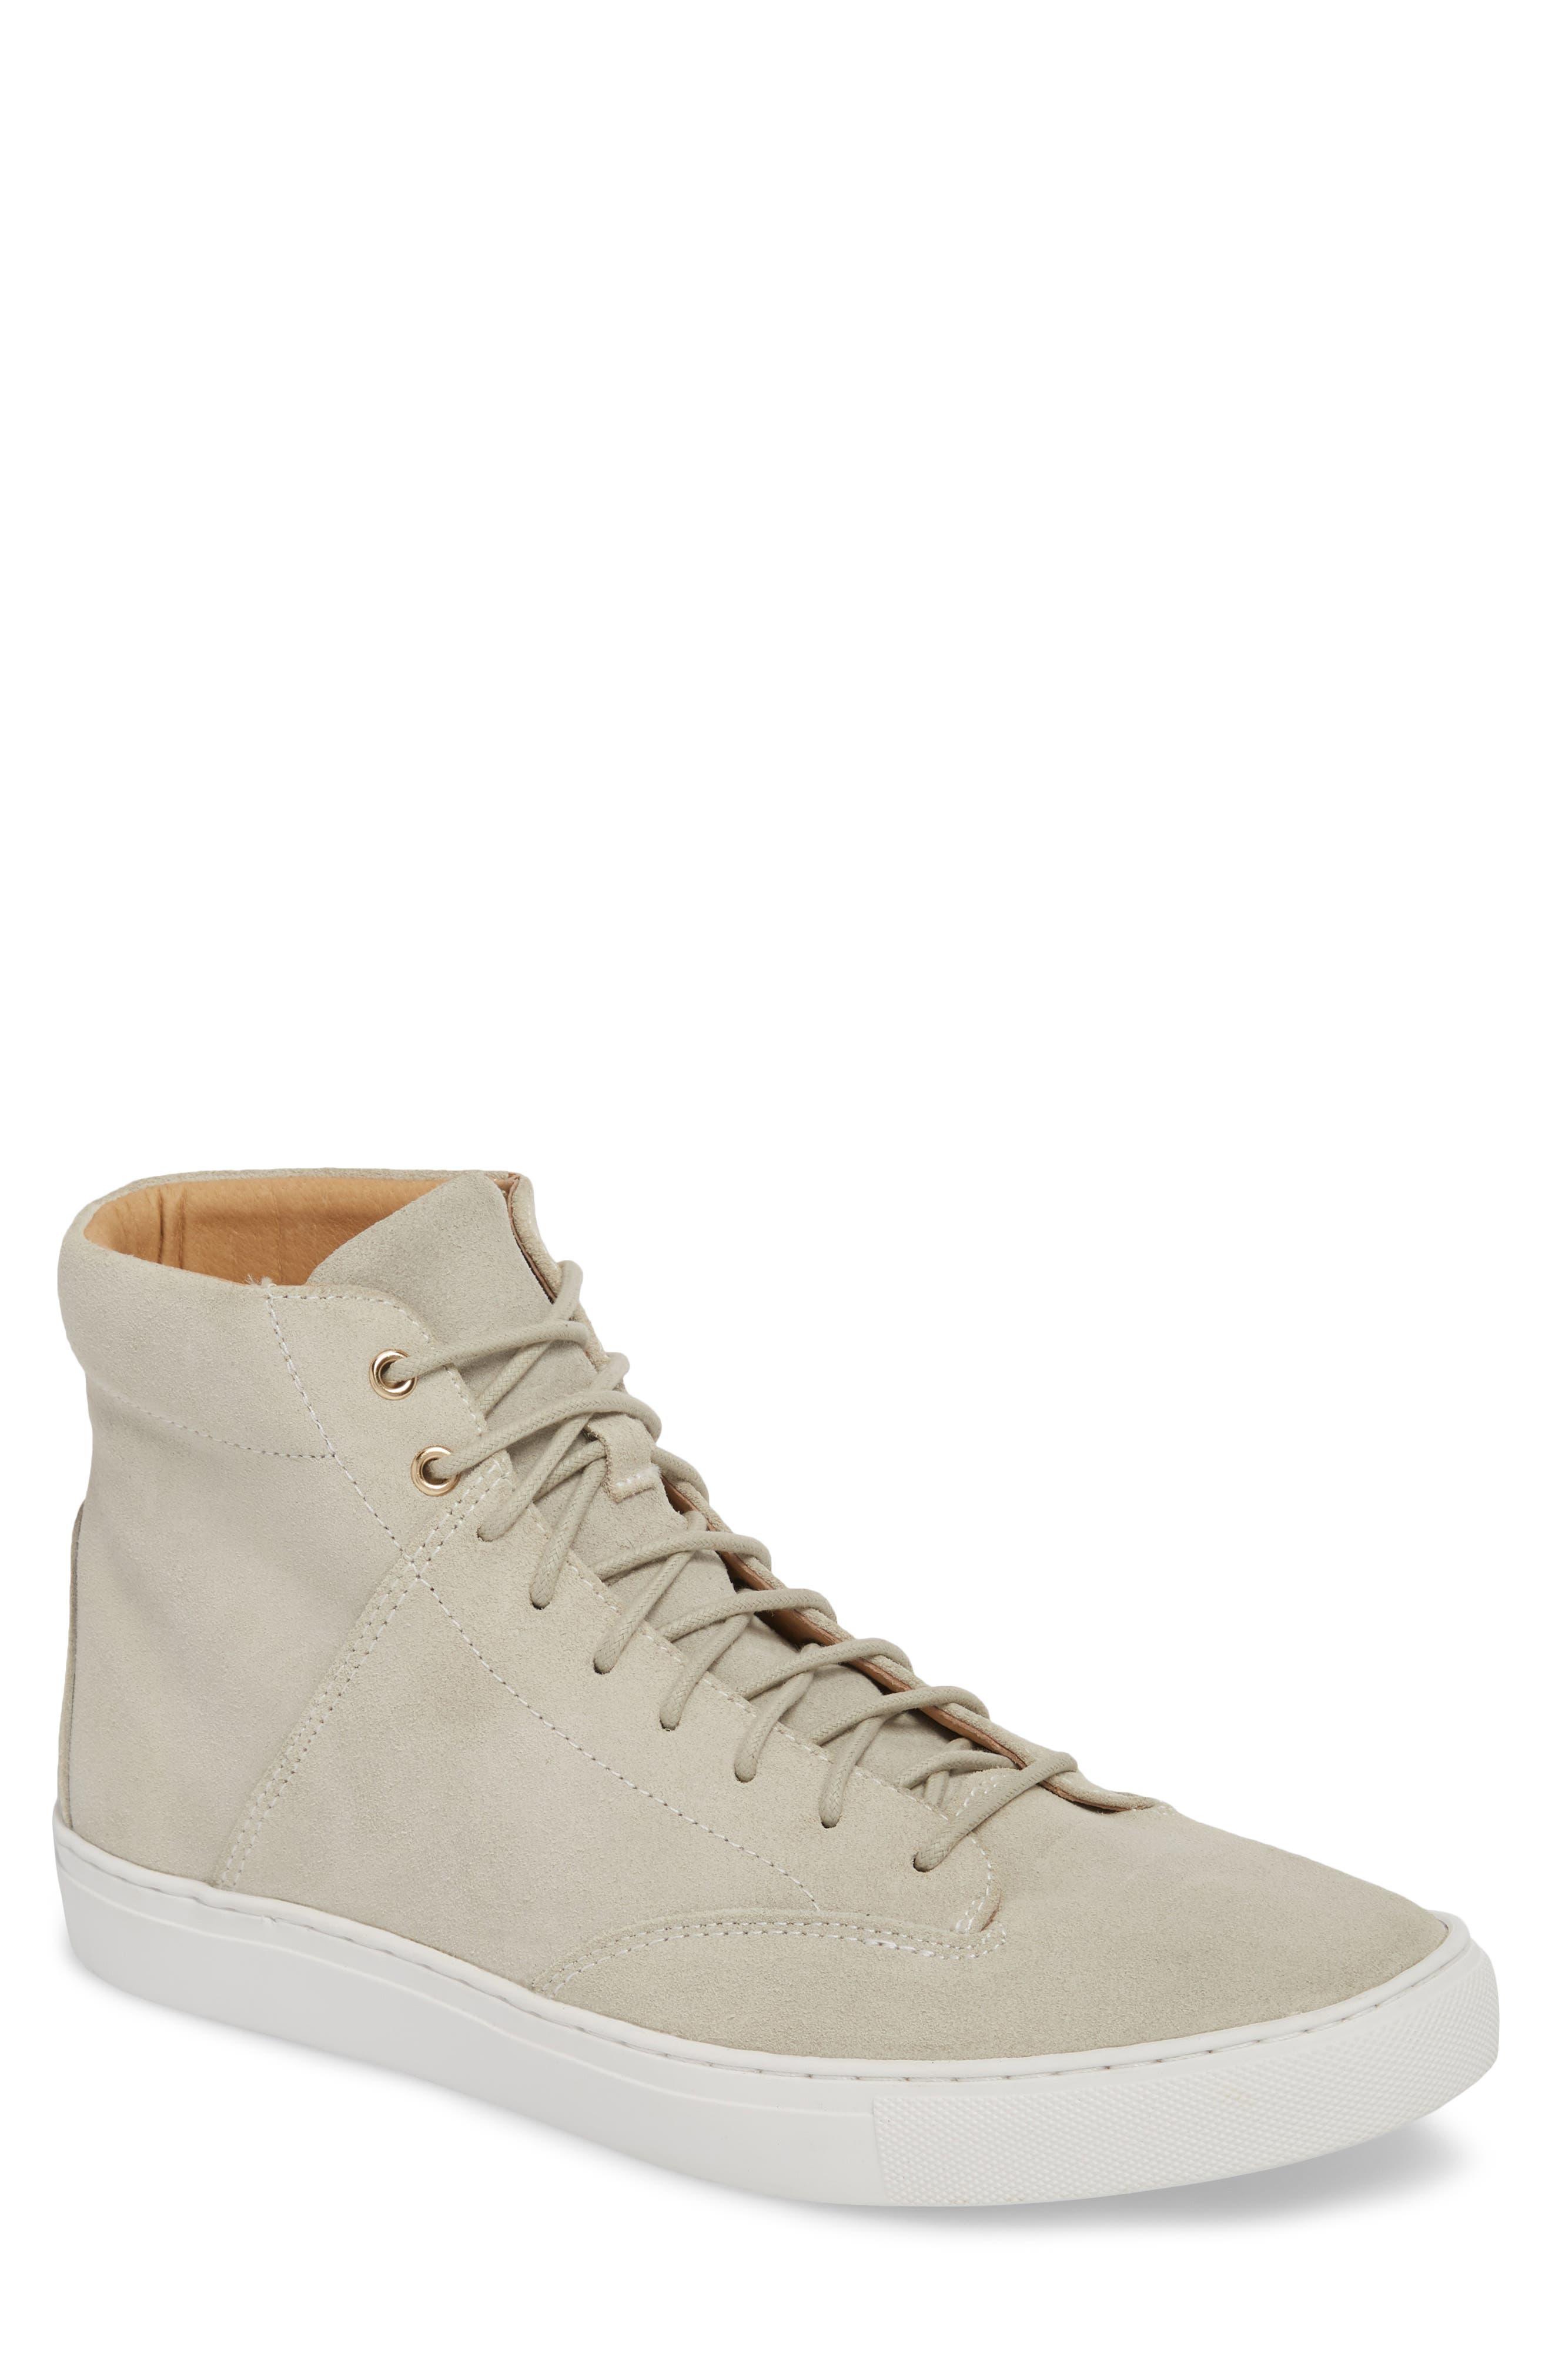 'Porter' High Top Sneaker,                             Main thumbnail 1, color,                             Quartz Leather